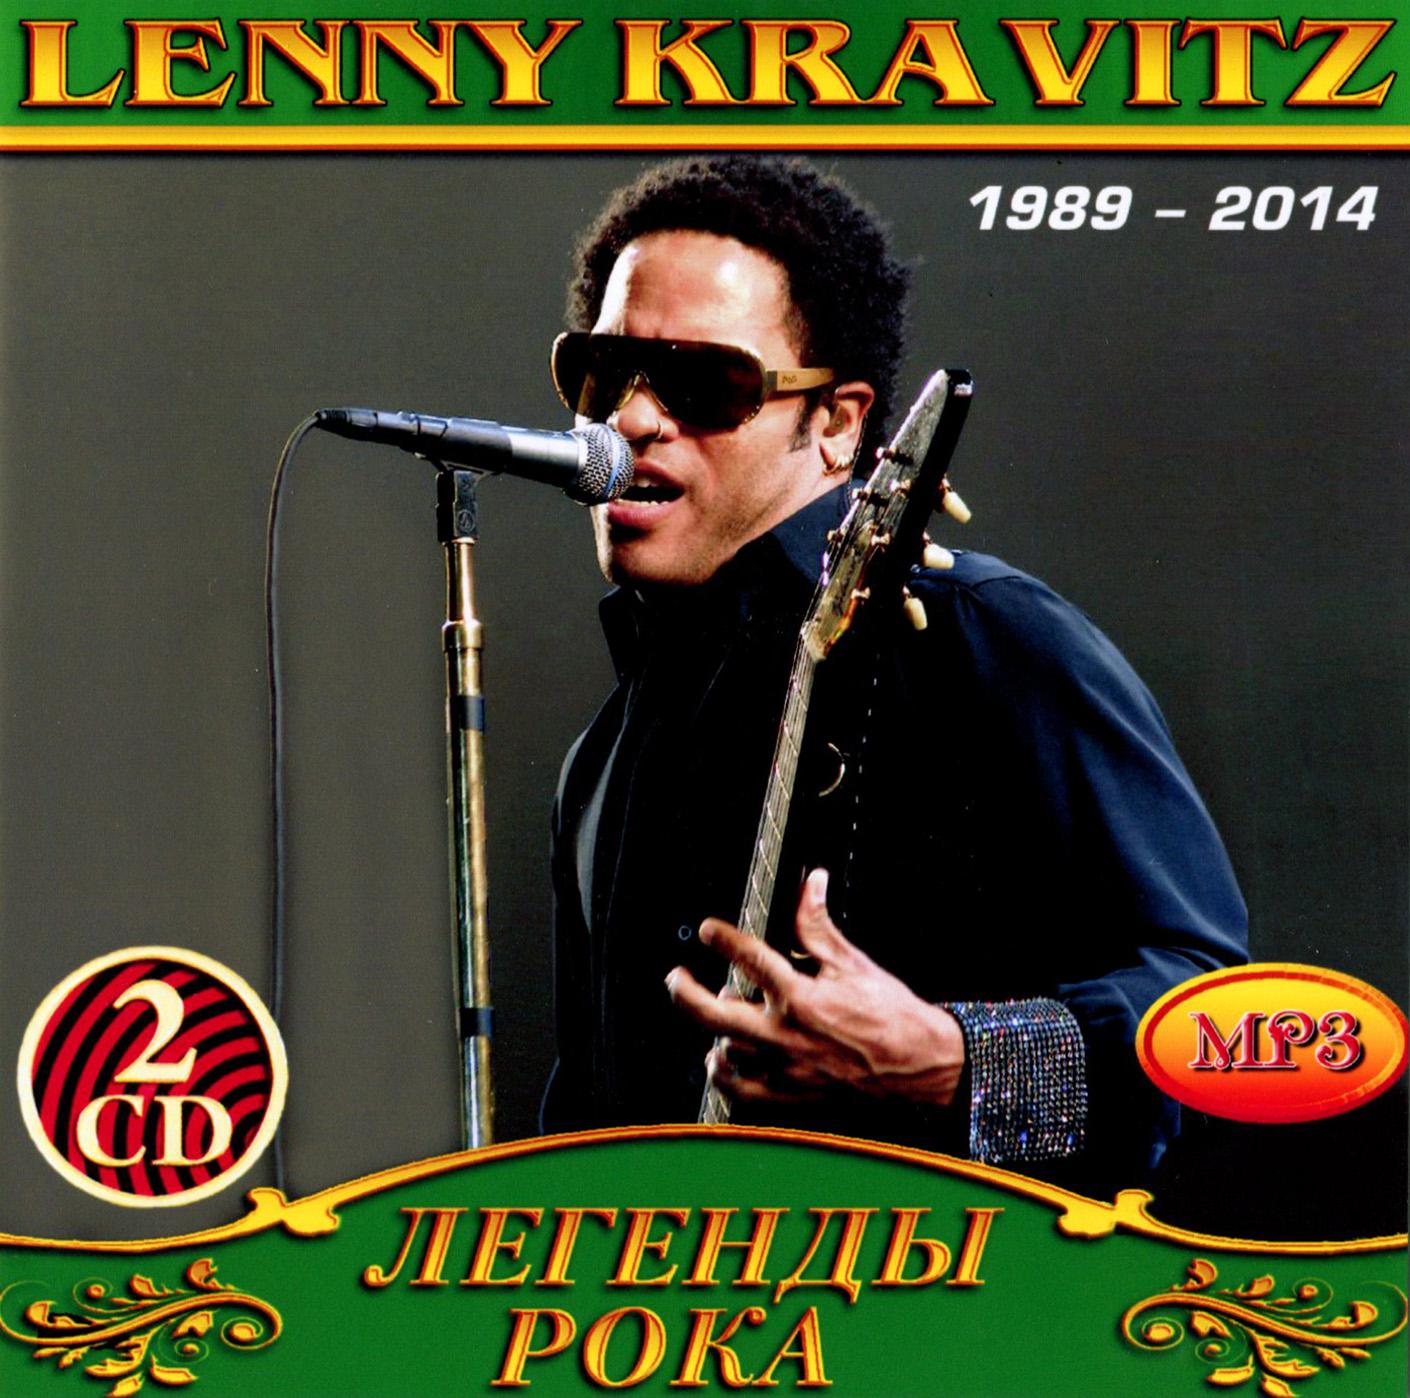 Lenny Kravitz 2cd [mp3]